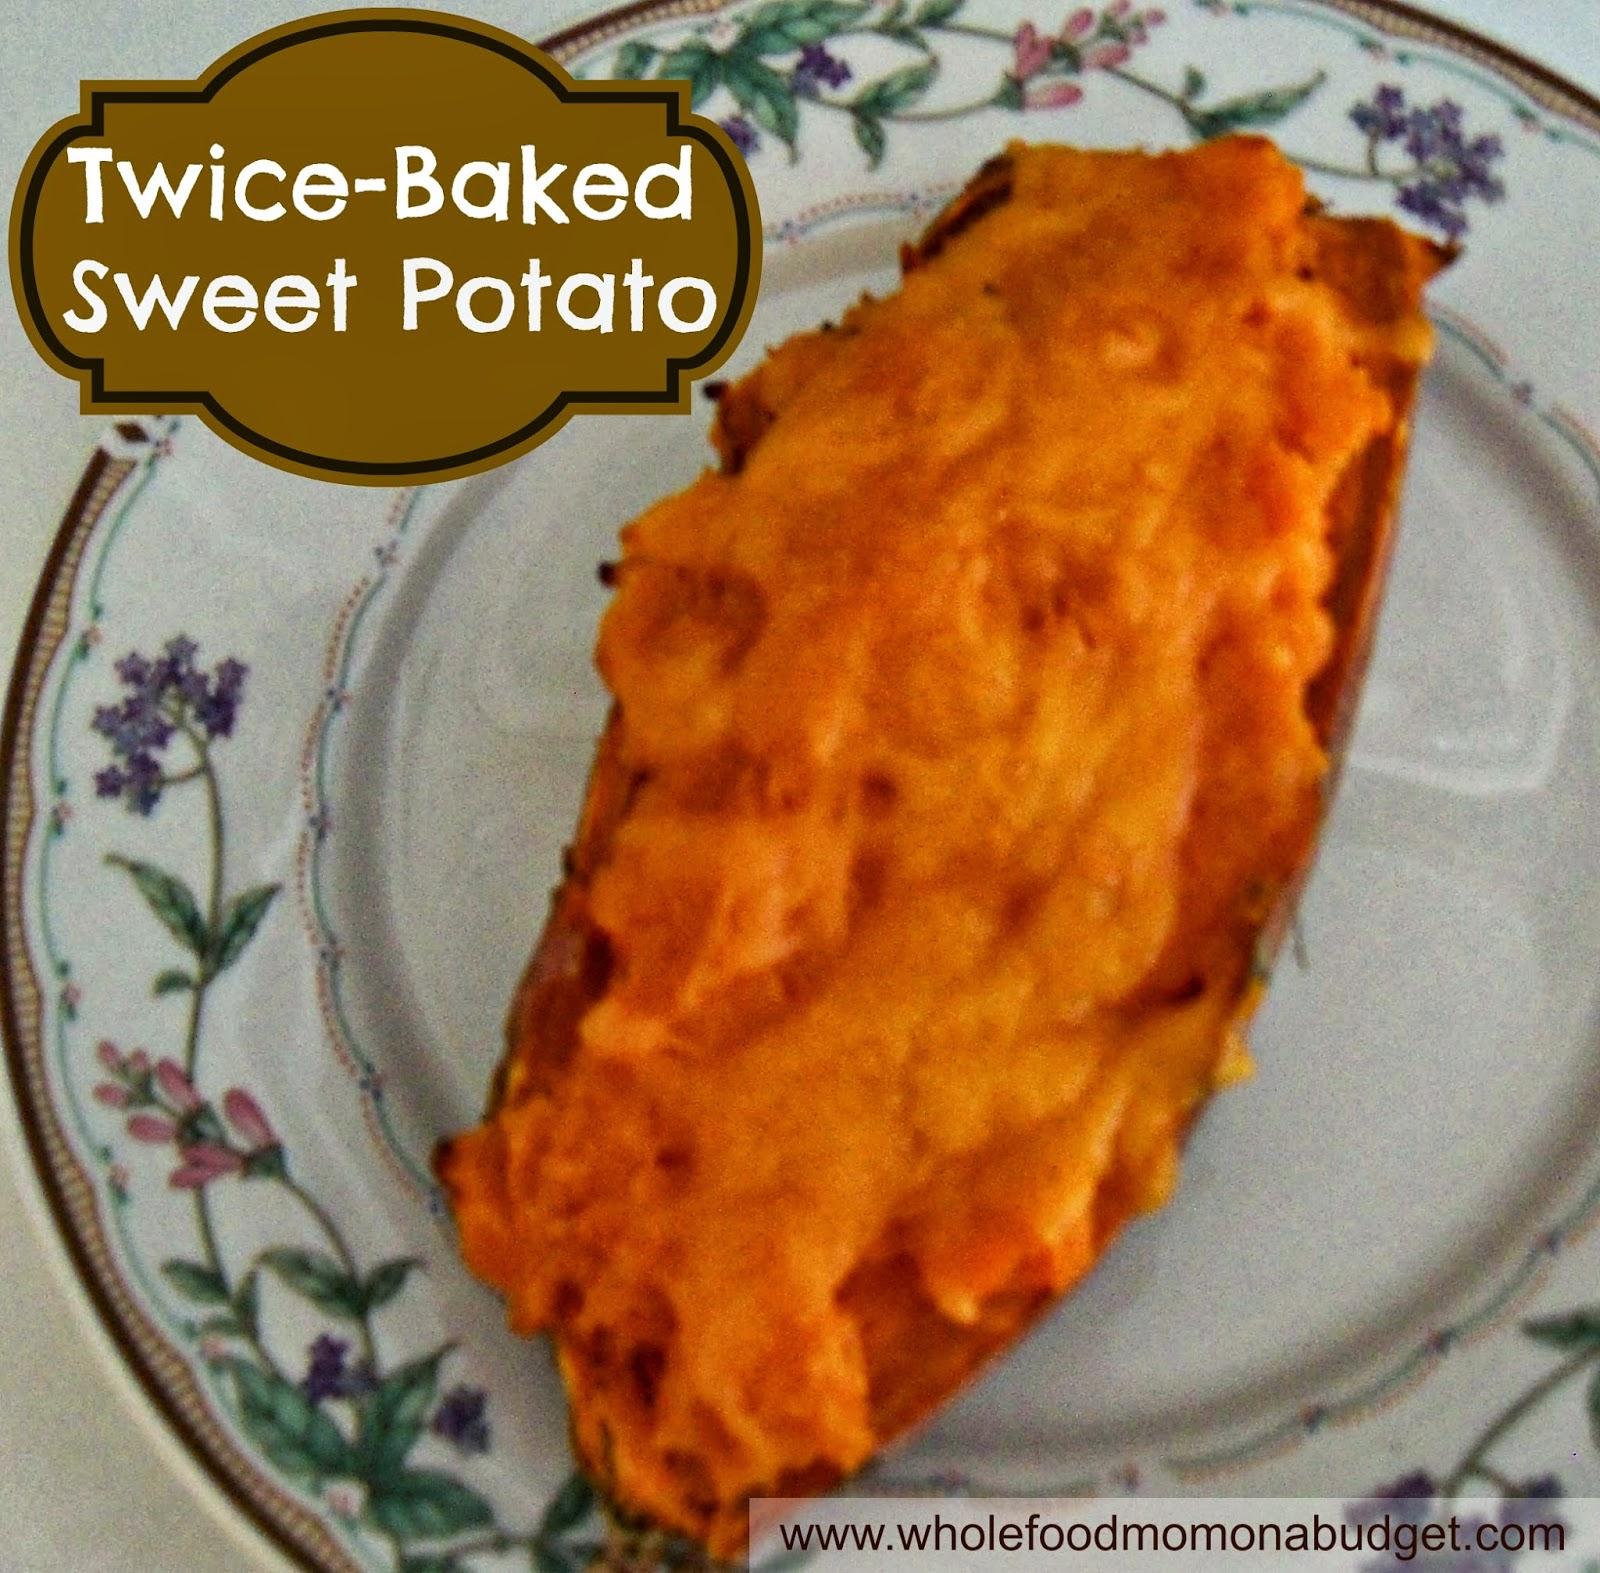 ... TwiceBaked Sweet Potatoes. Healthy Twice Baked Sweet Potato Recipes